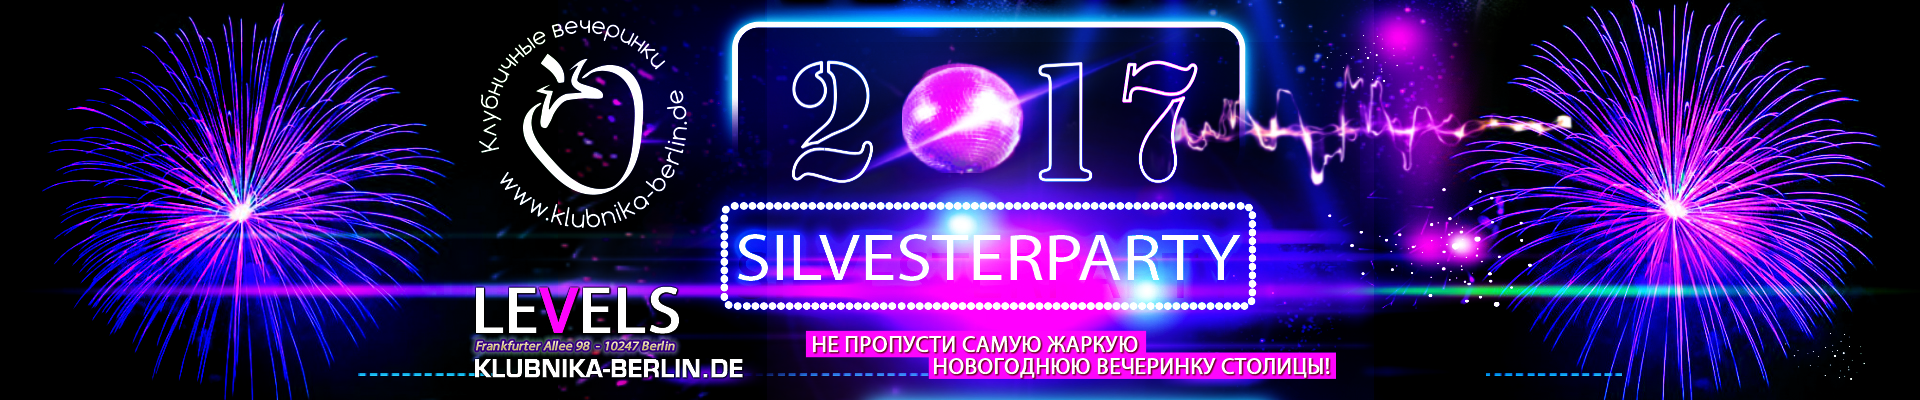 slider-neu-2017